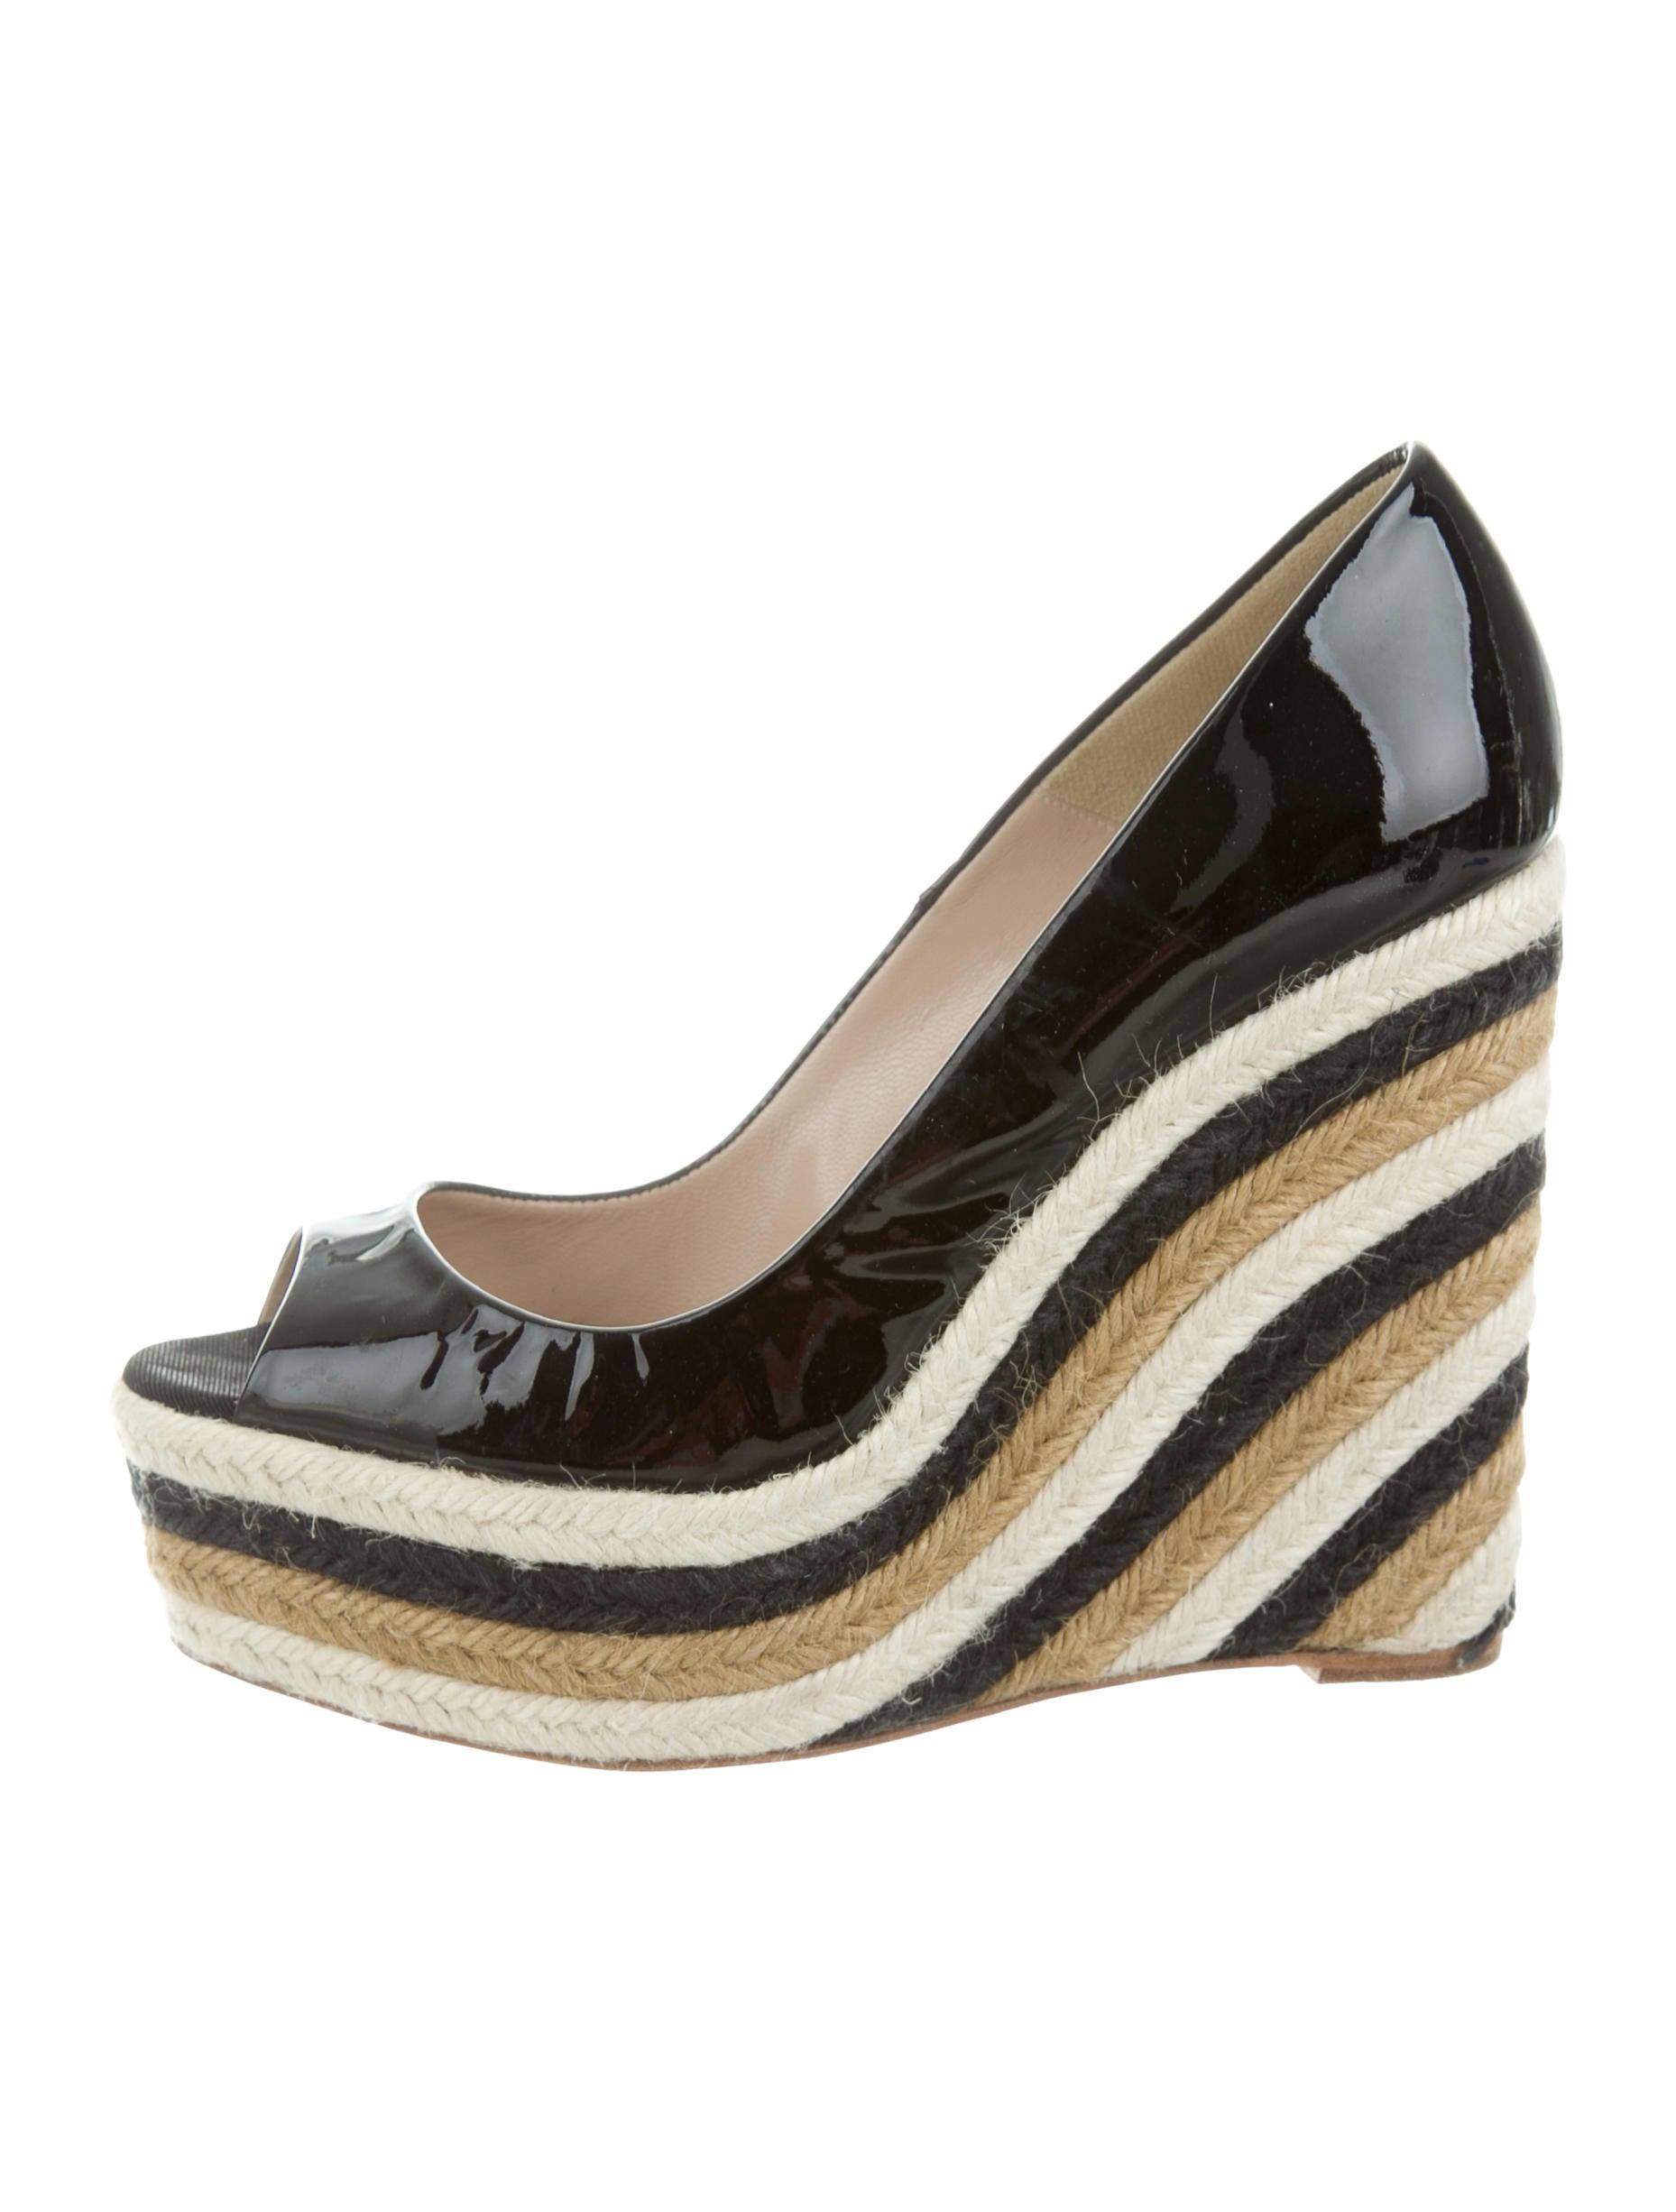 brian atwood peep toe espadrille wedges shoes bri23483